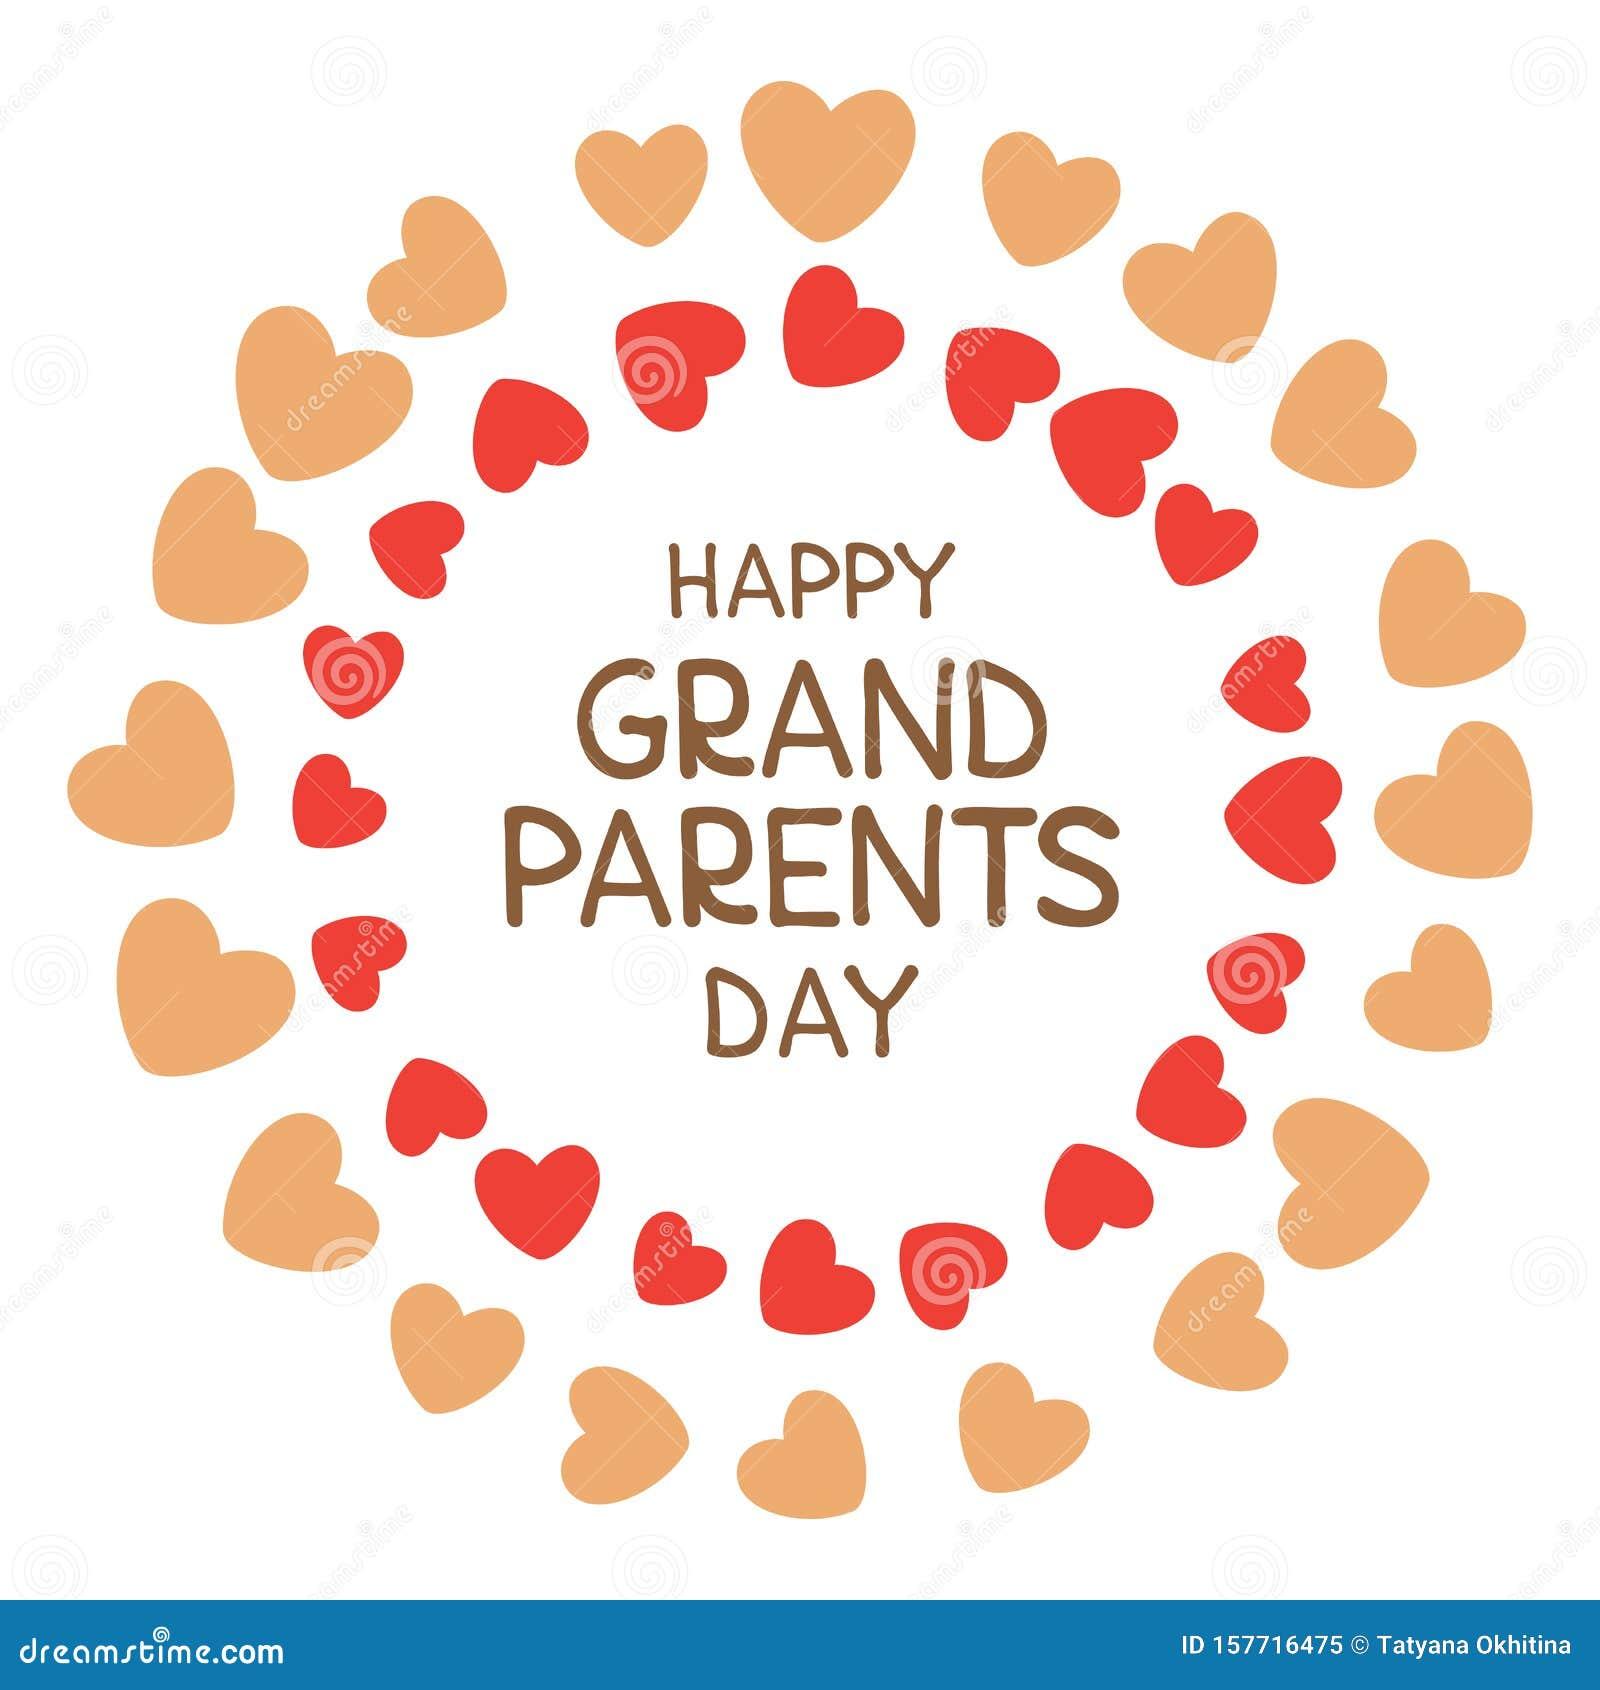 Grandparents day-05